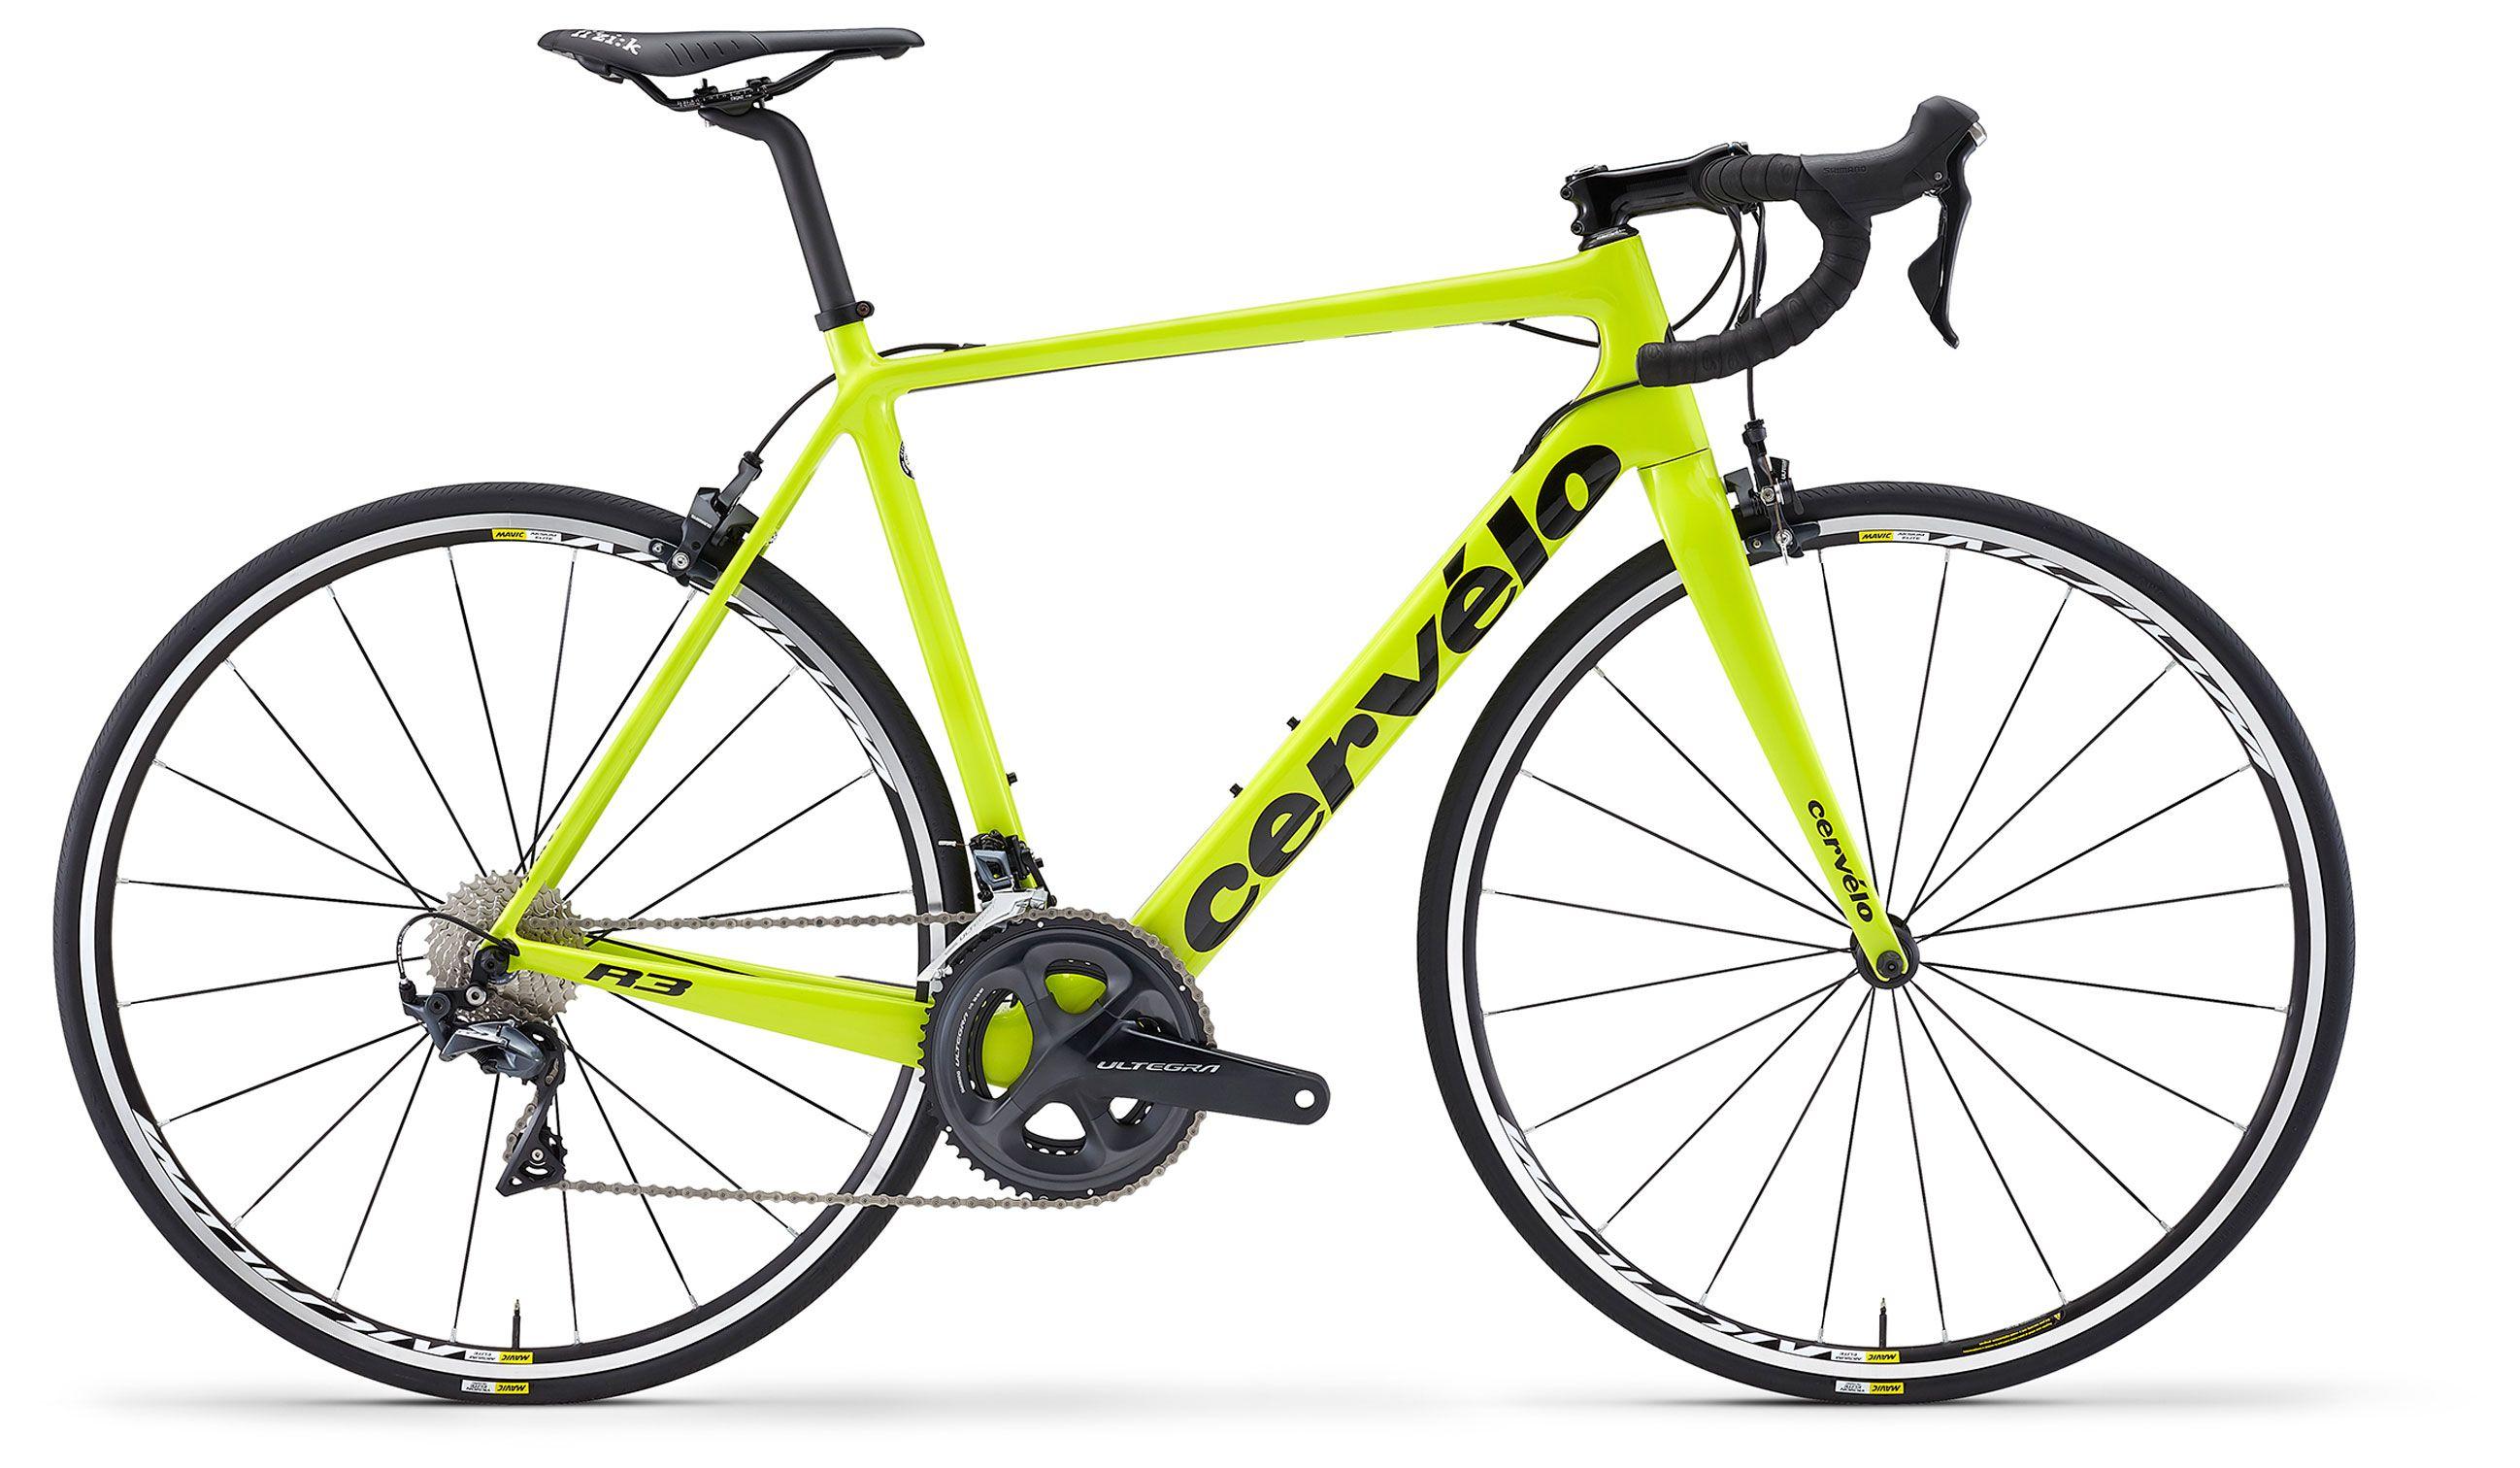 Велосипед Cervelo R3 Ultegra Di2 2018 велосипед cervelo s3 ultegra 2018